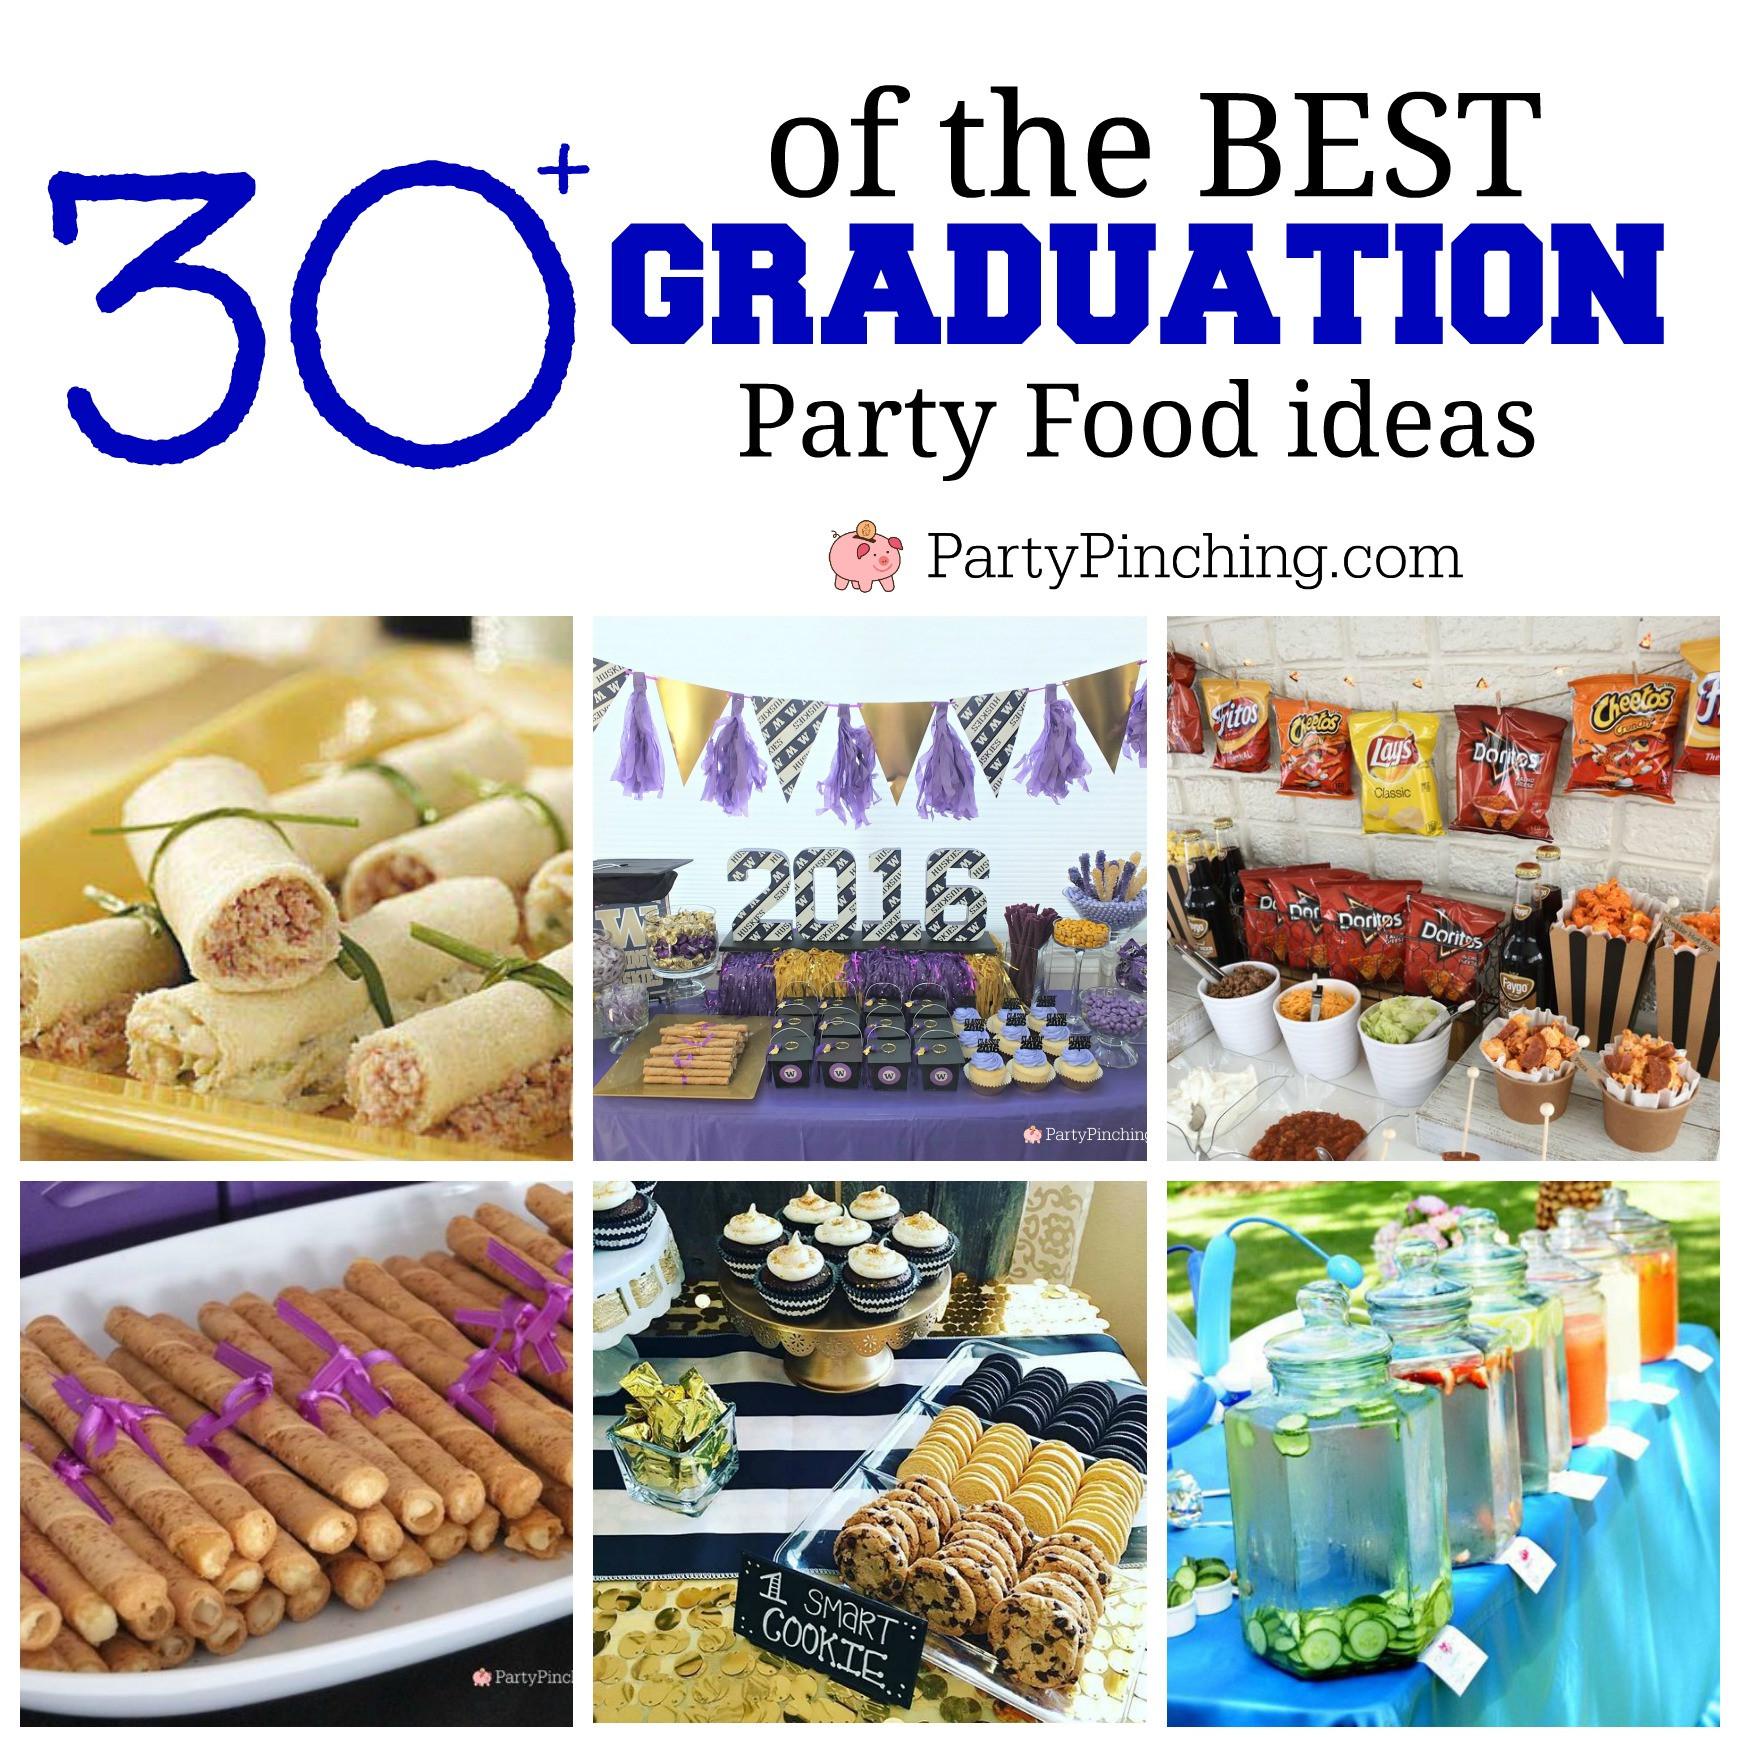 Doctoral Graduation Party Ideas  Best Graduation Party Food ideas best grad open house